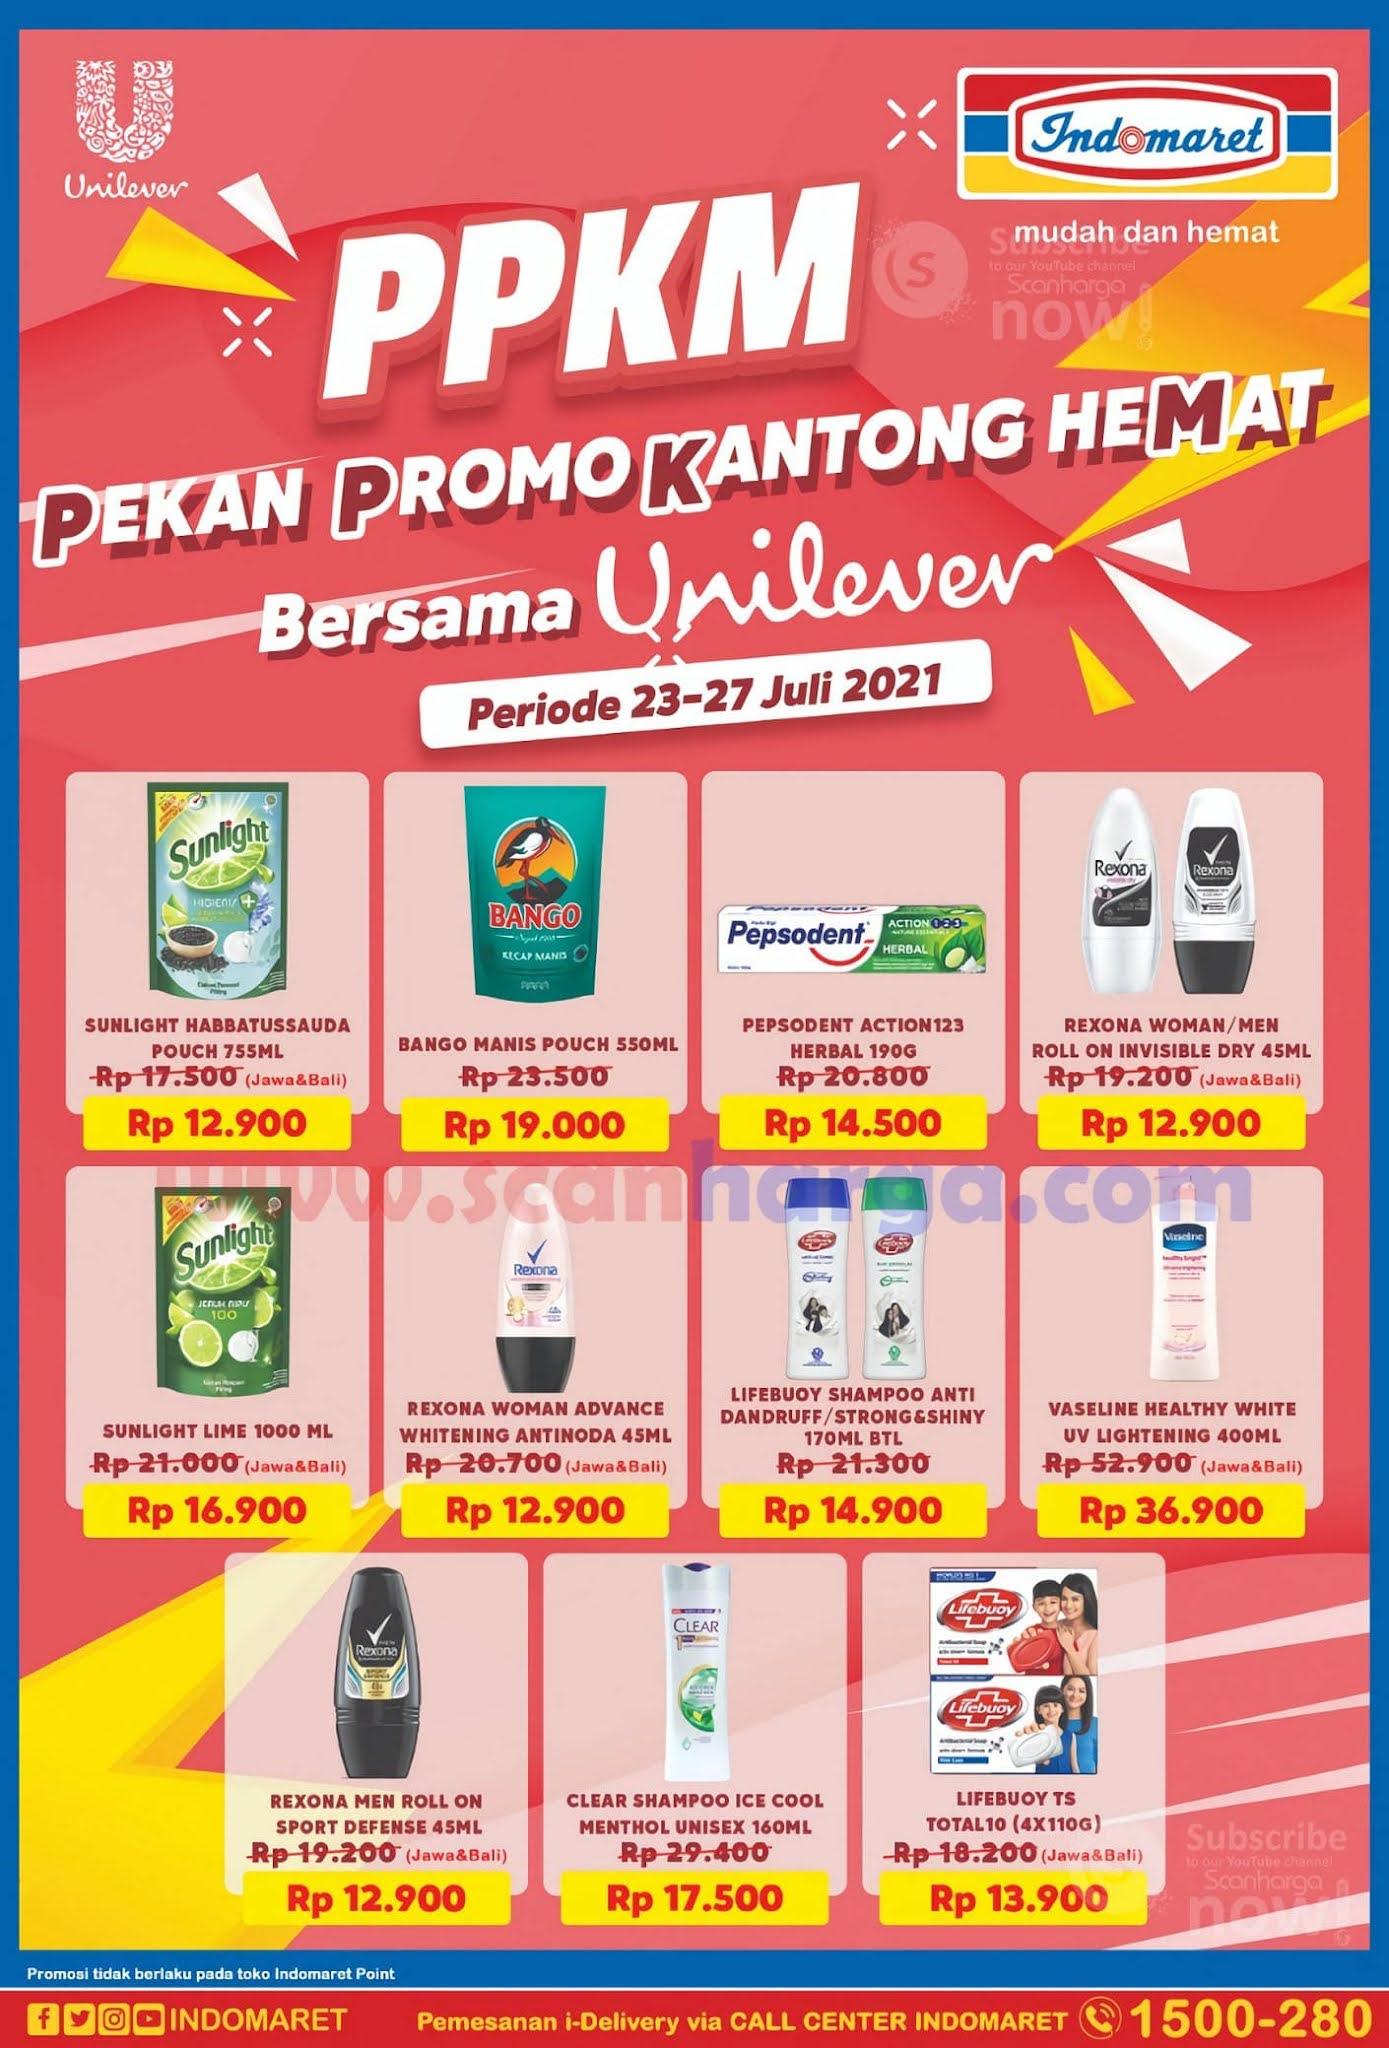 Indomaret PPKM (Pekan Promo Kantong Hemat) Periode 23 - 27 Juli 2021